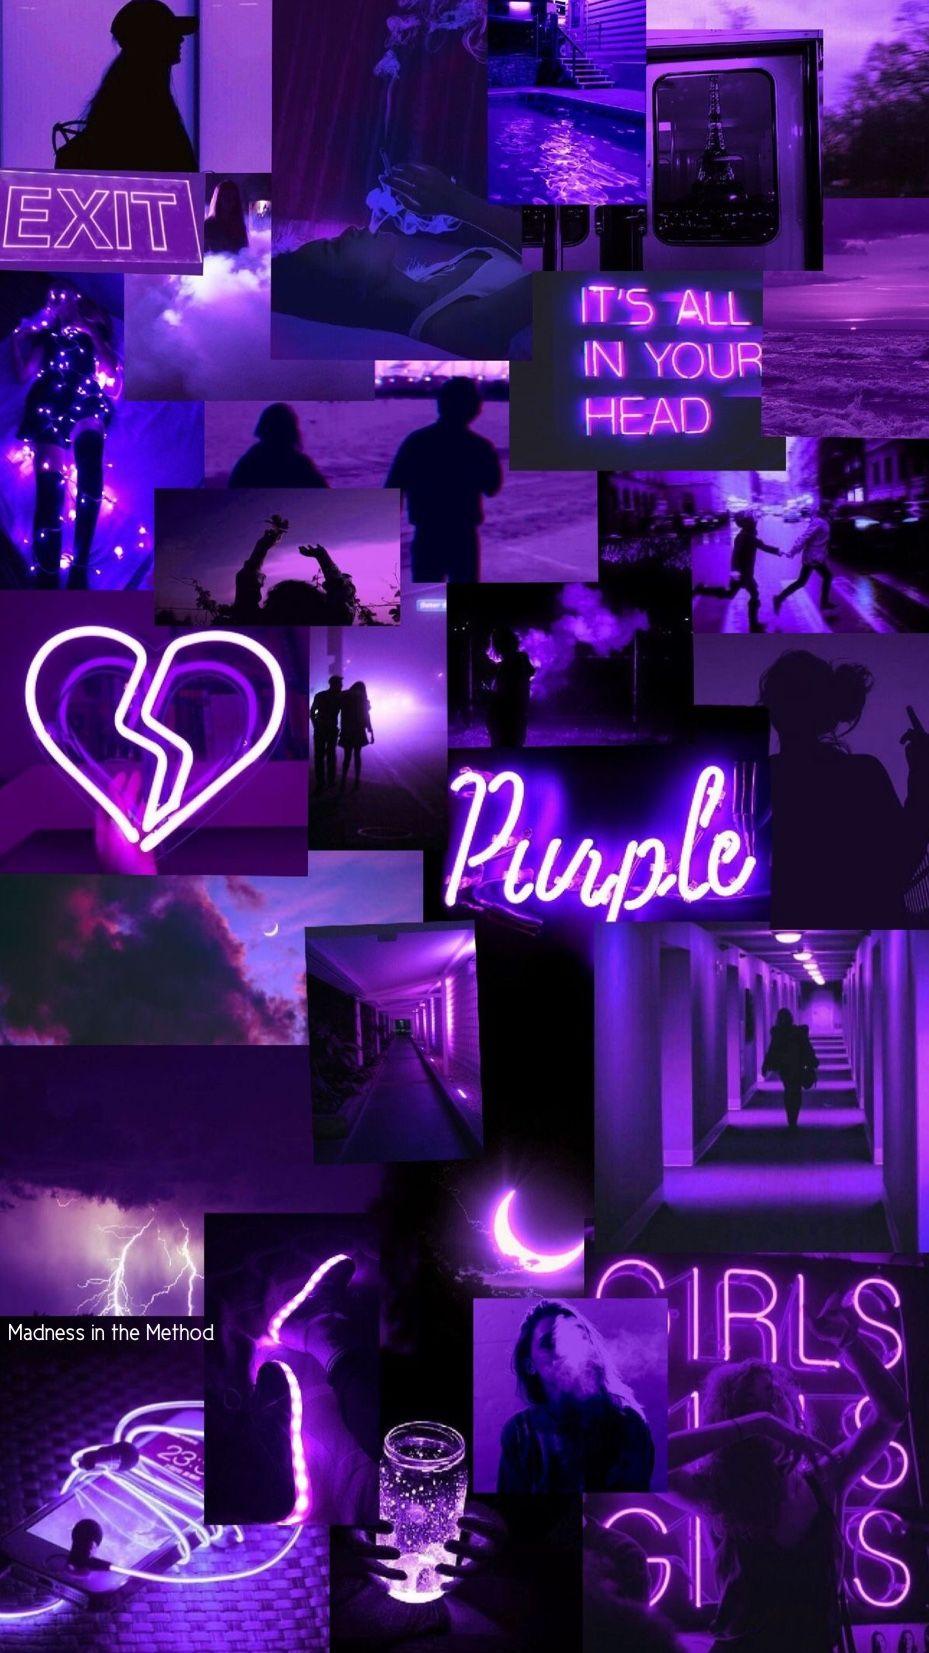 purple aesthetic iphone wallpaper iphone wallpaper tumblr aesthetic purple wallpaper phone purple aesthetic iphone wallpaper